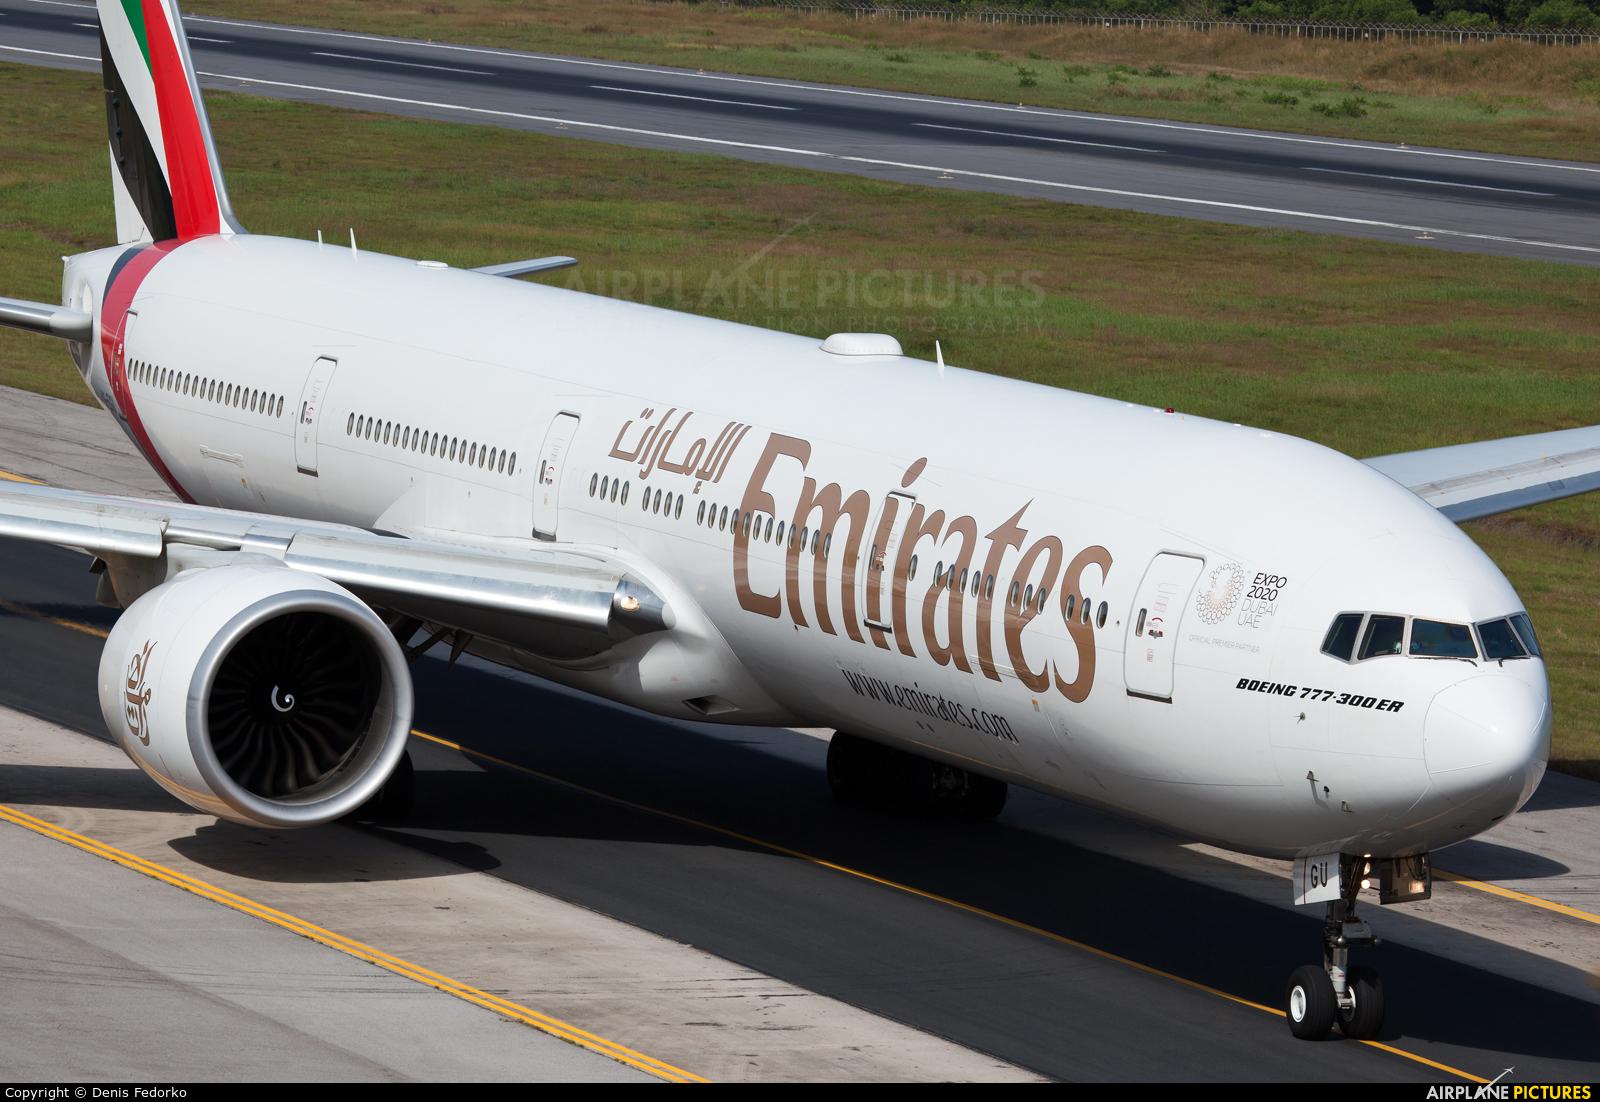 Emirates Airlines A6-EGU aircraft at Phuket